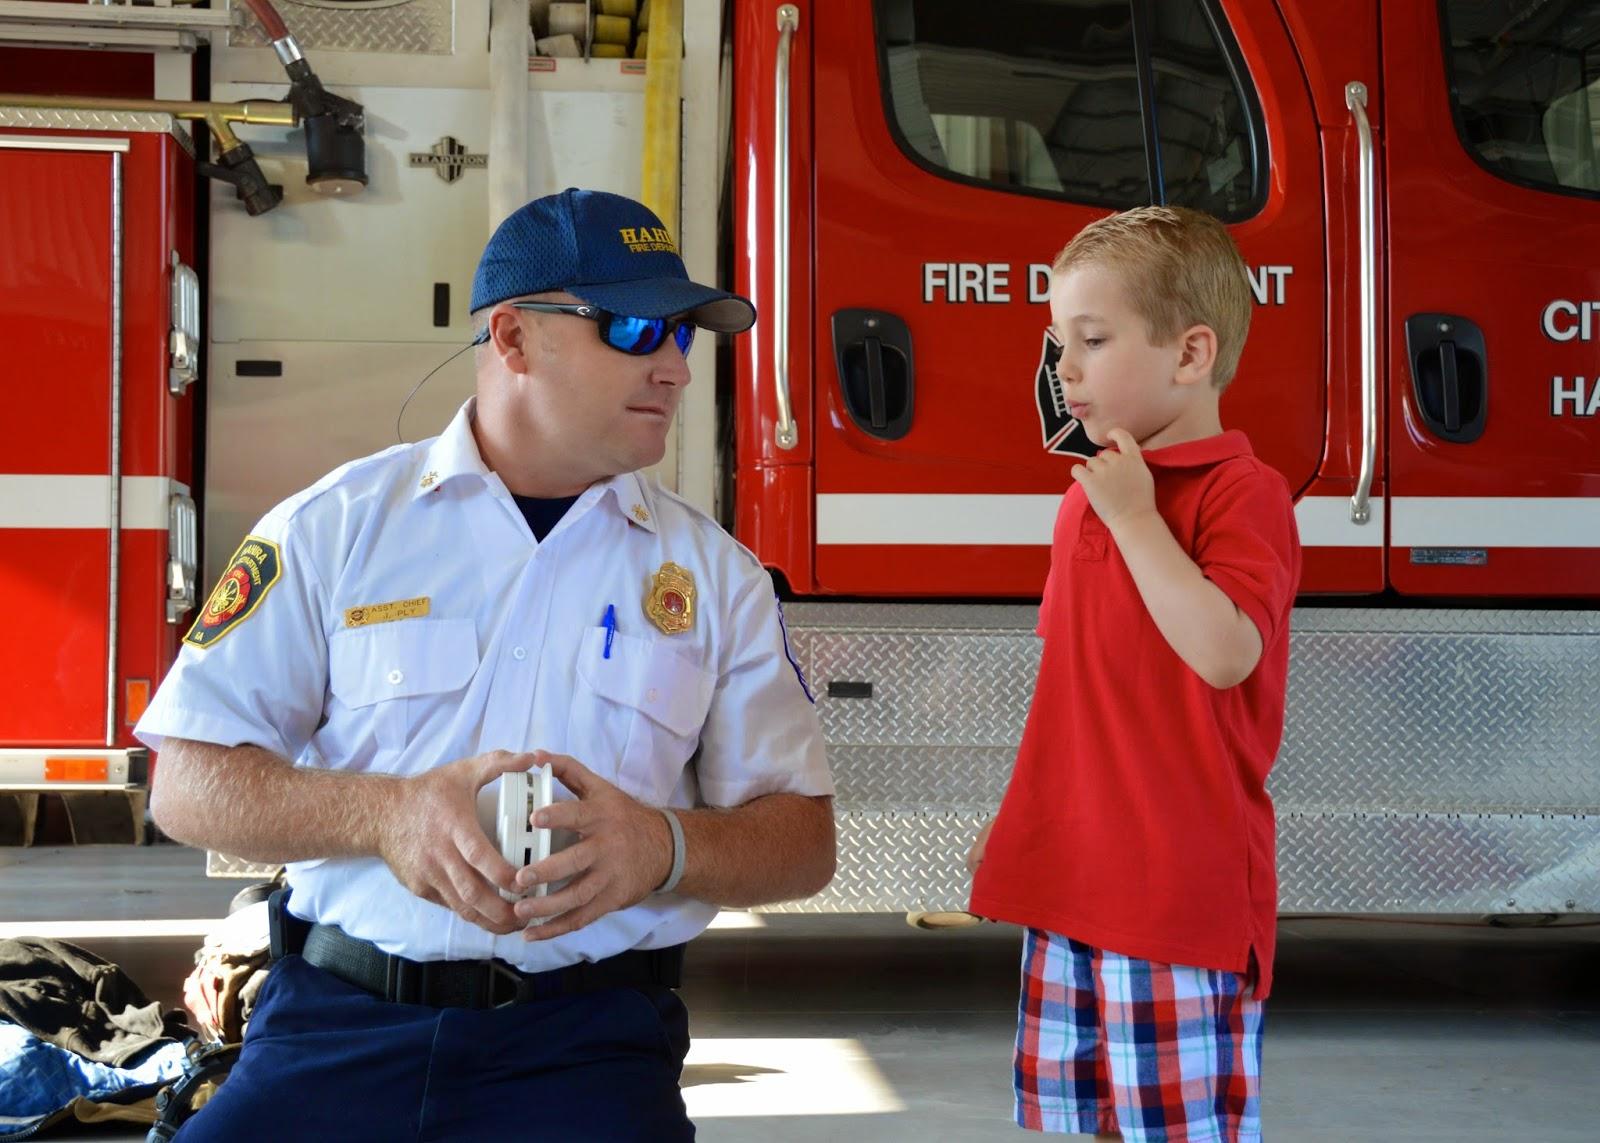 Fire Station Visit 2014